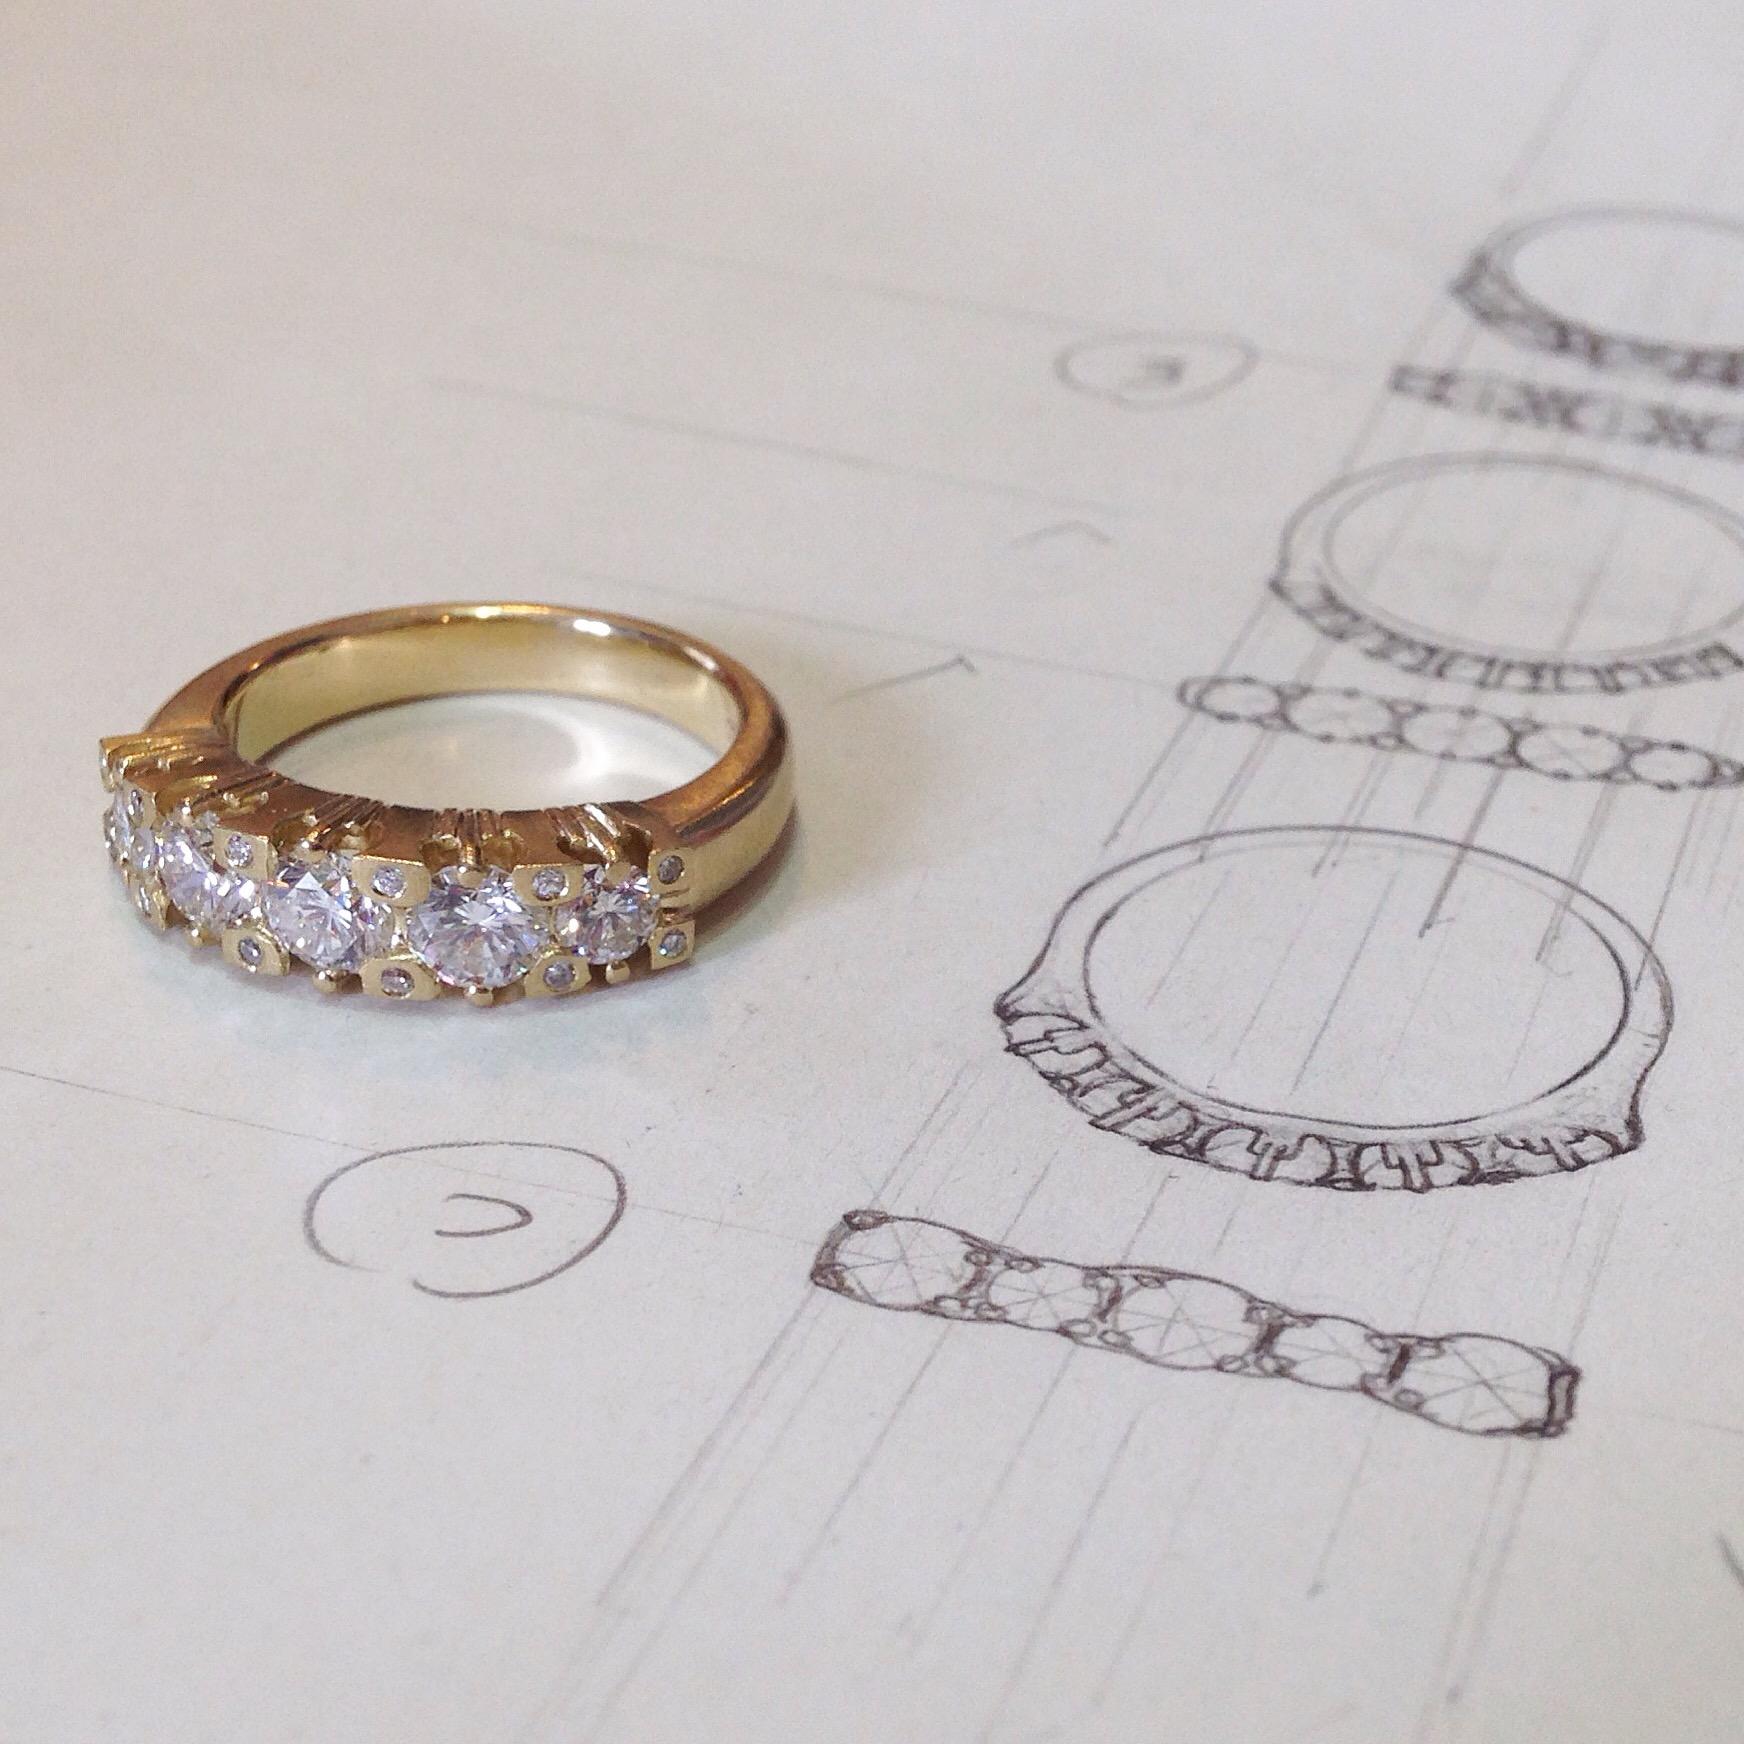 5-Stone Ring